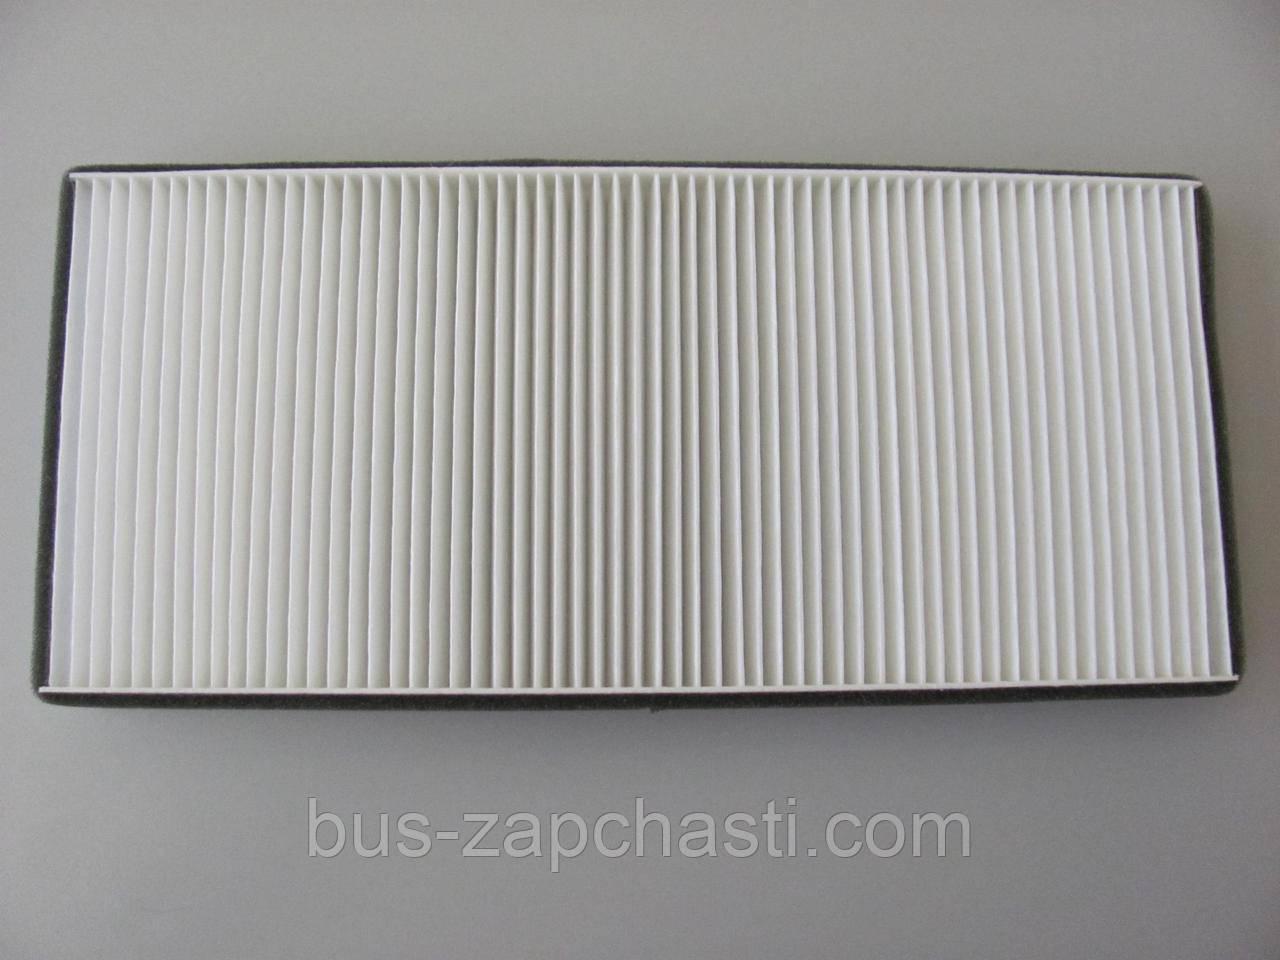 Фильтр салона на MB Sprinter, VW LT 1996-2006 — Wunder (Турция) — WP-700